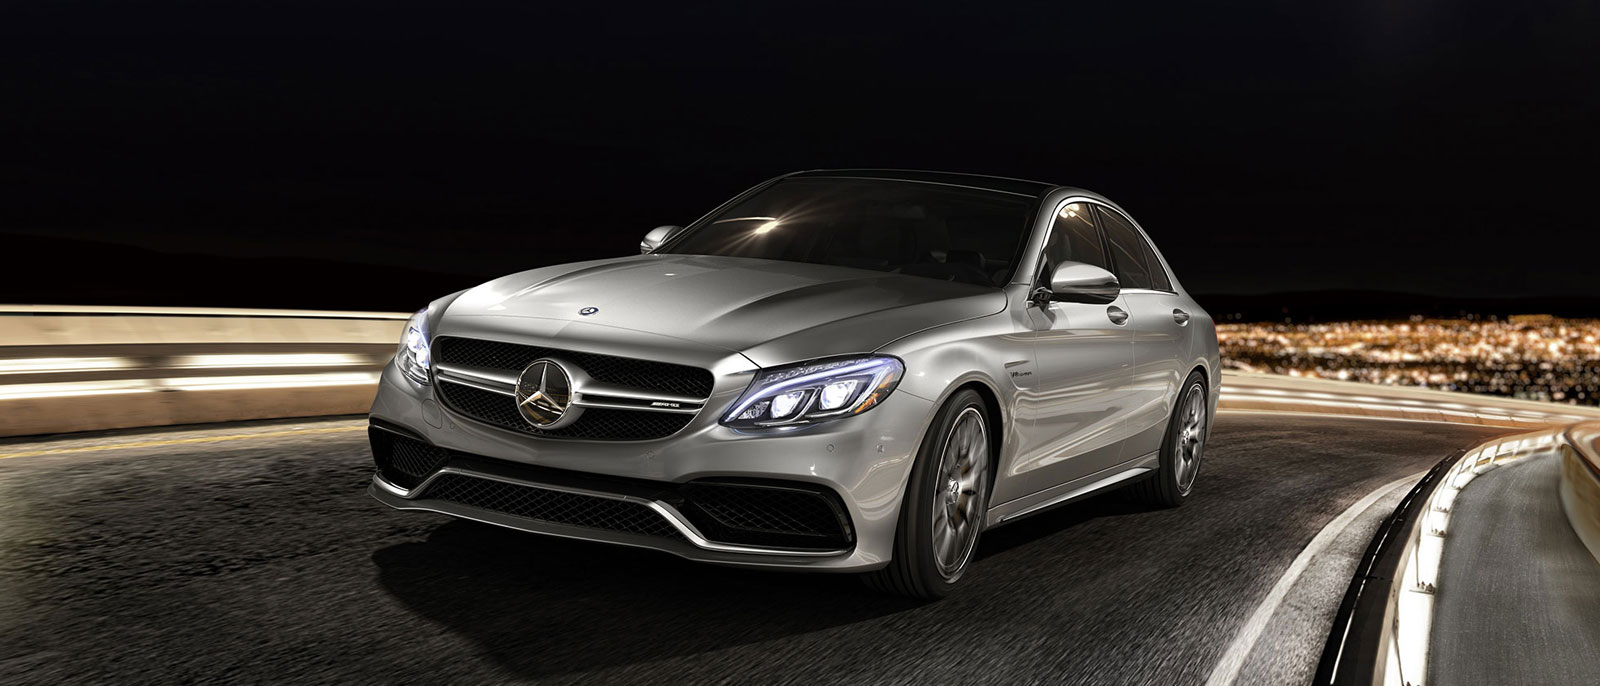 Enjoy Innovation With The 2016 Mercedes Benz Amg C63 Sedan